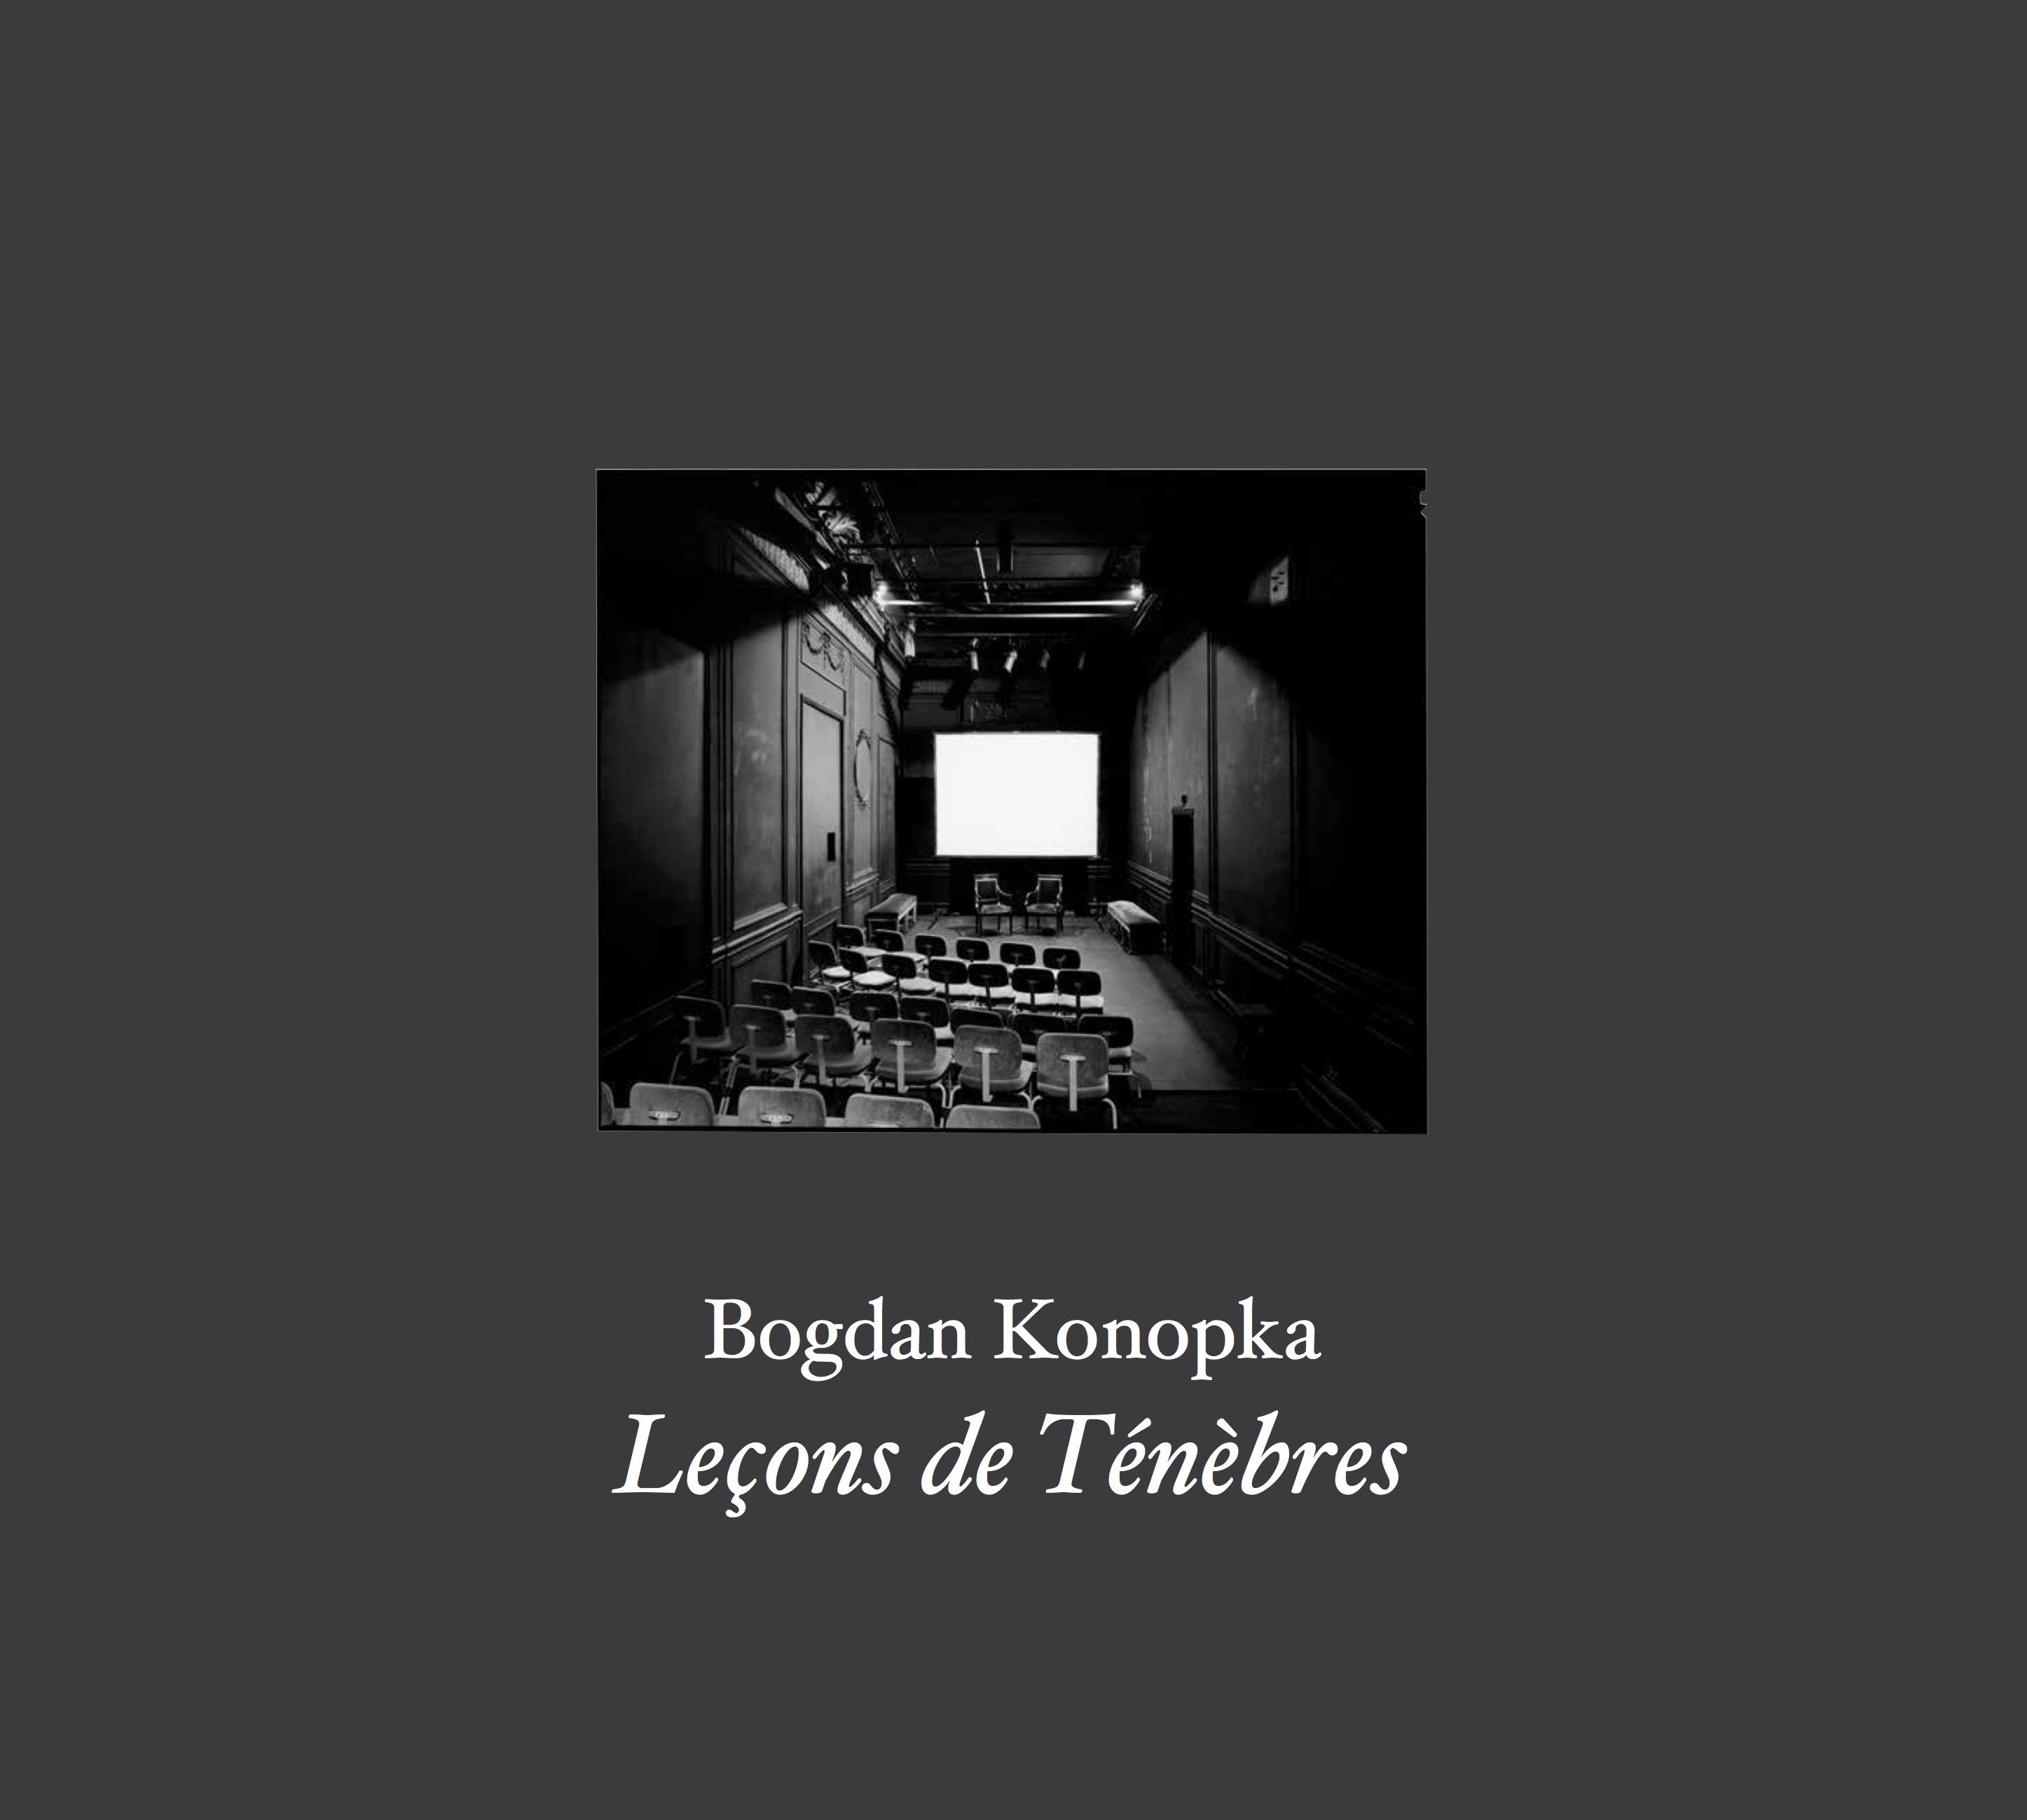 Bogdan Konopka, Leçons de Ténèbres